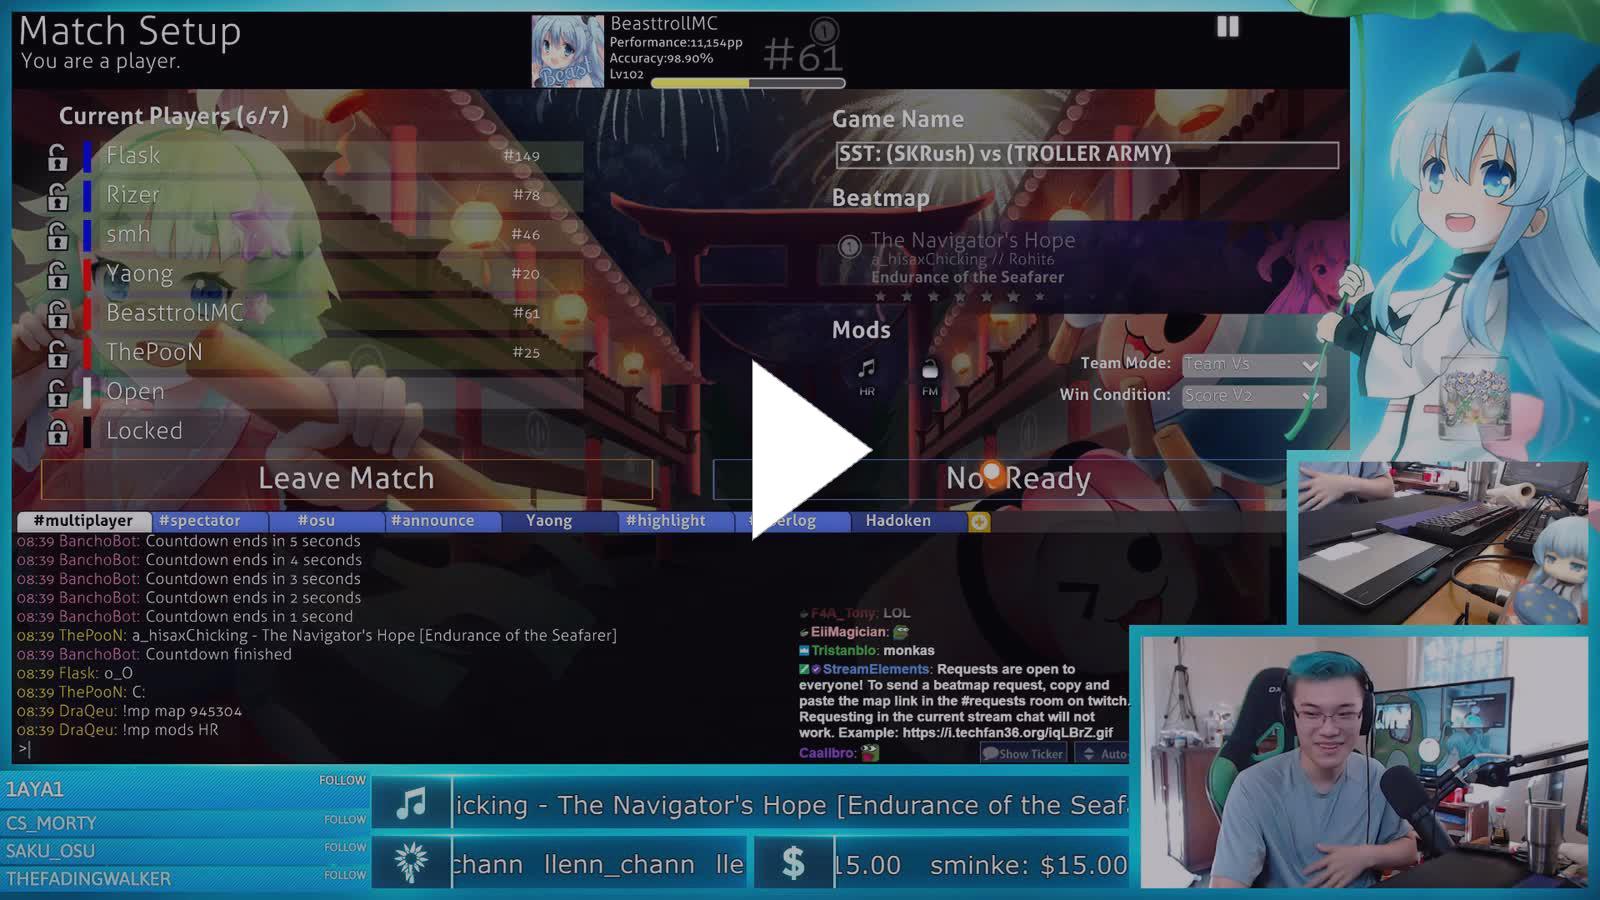 BeasttrollMC - Beast cheating on Noel  (Look at TV) - Twitch